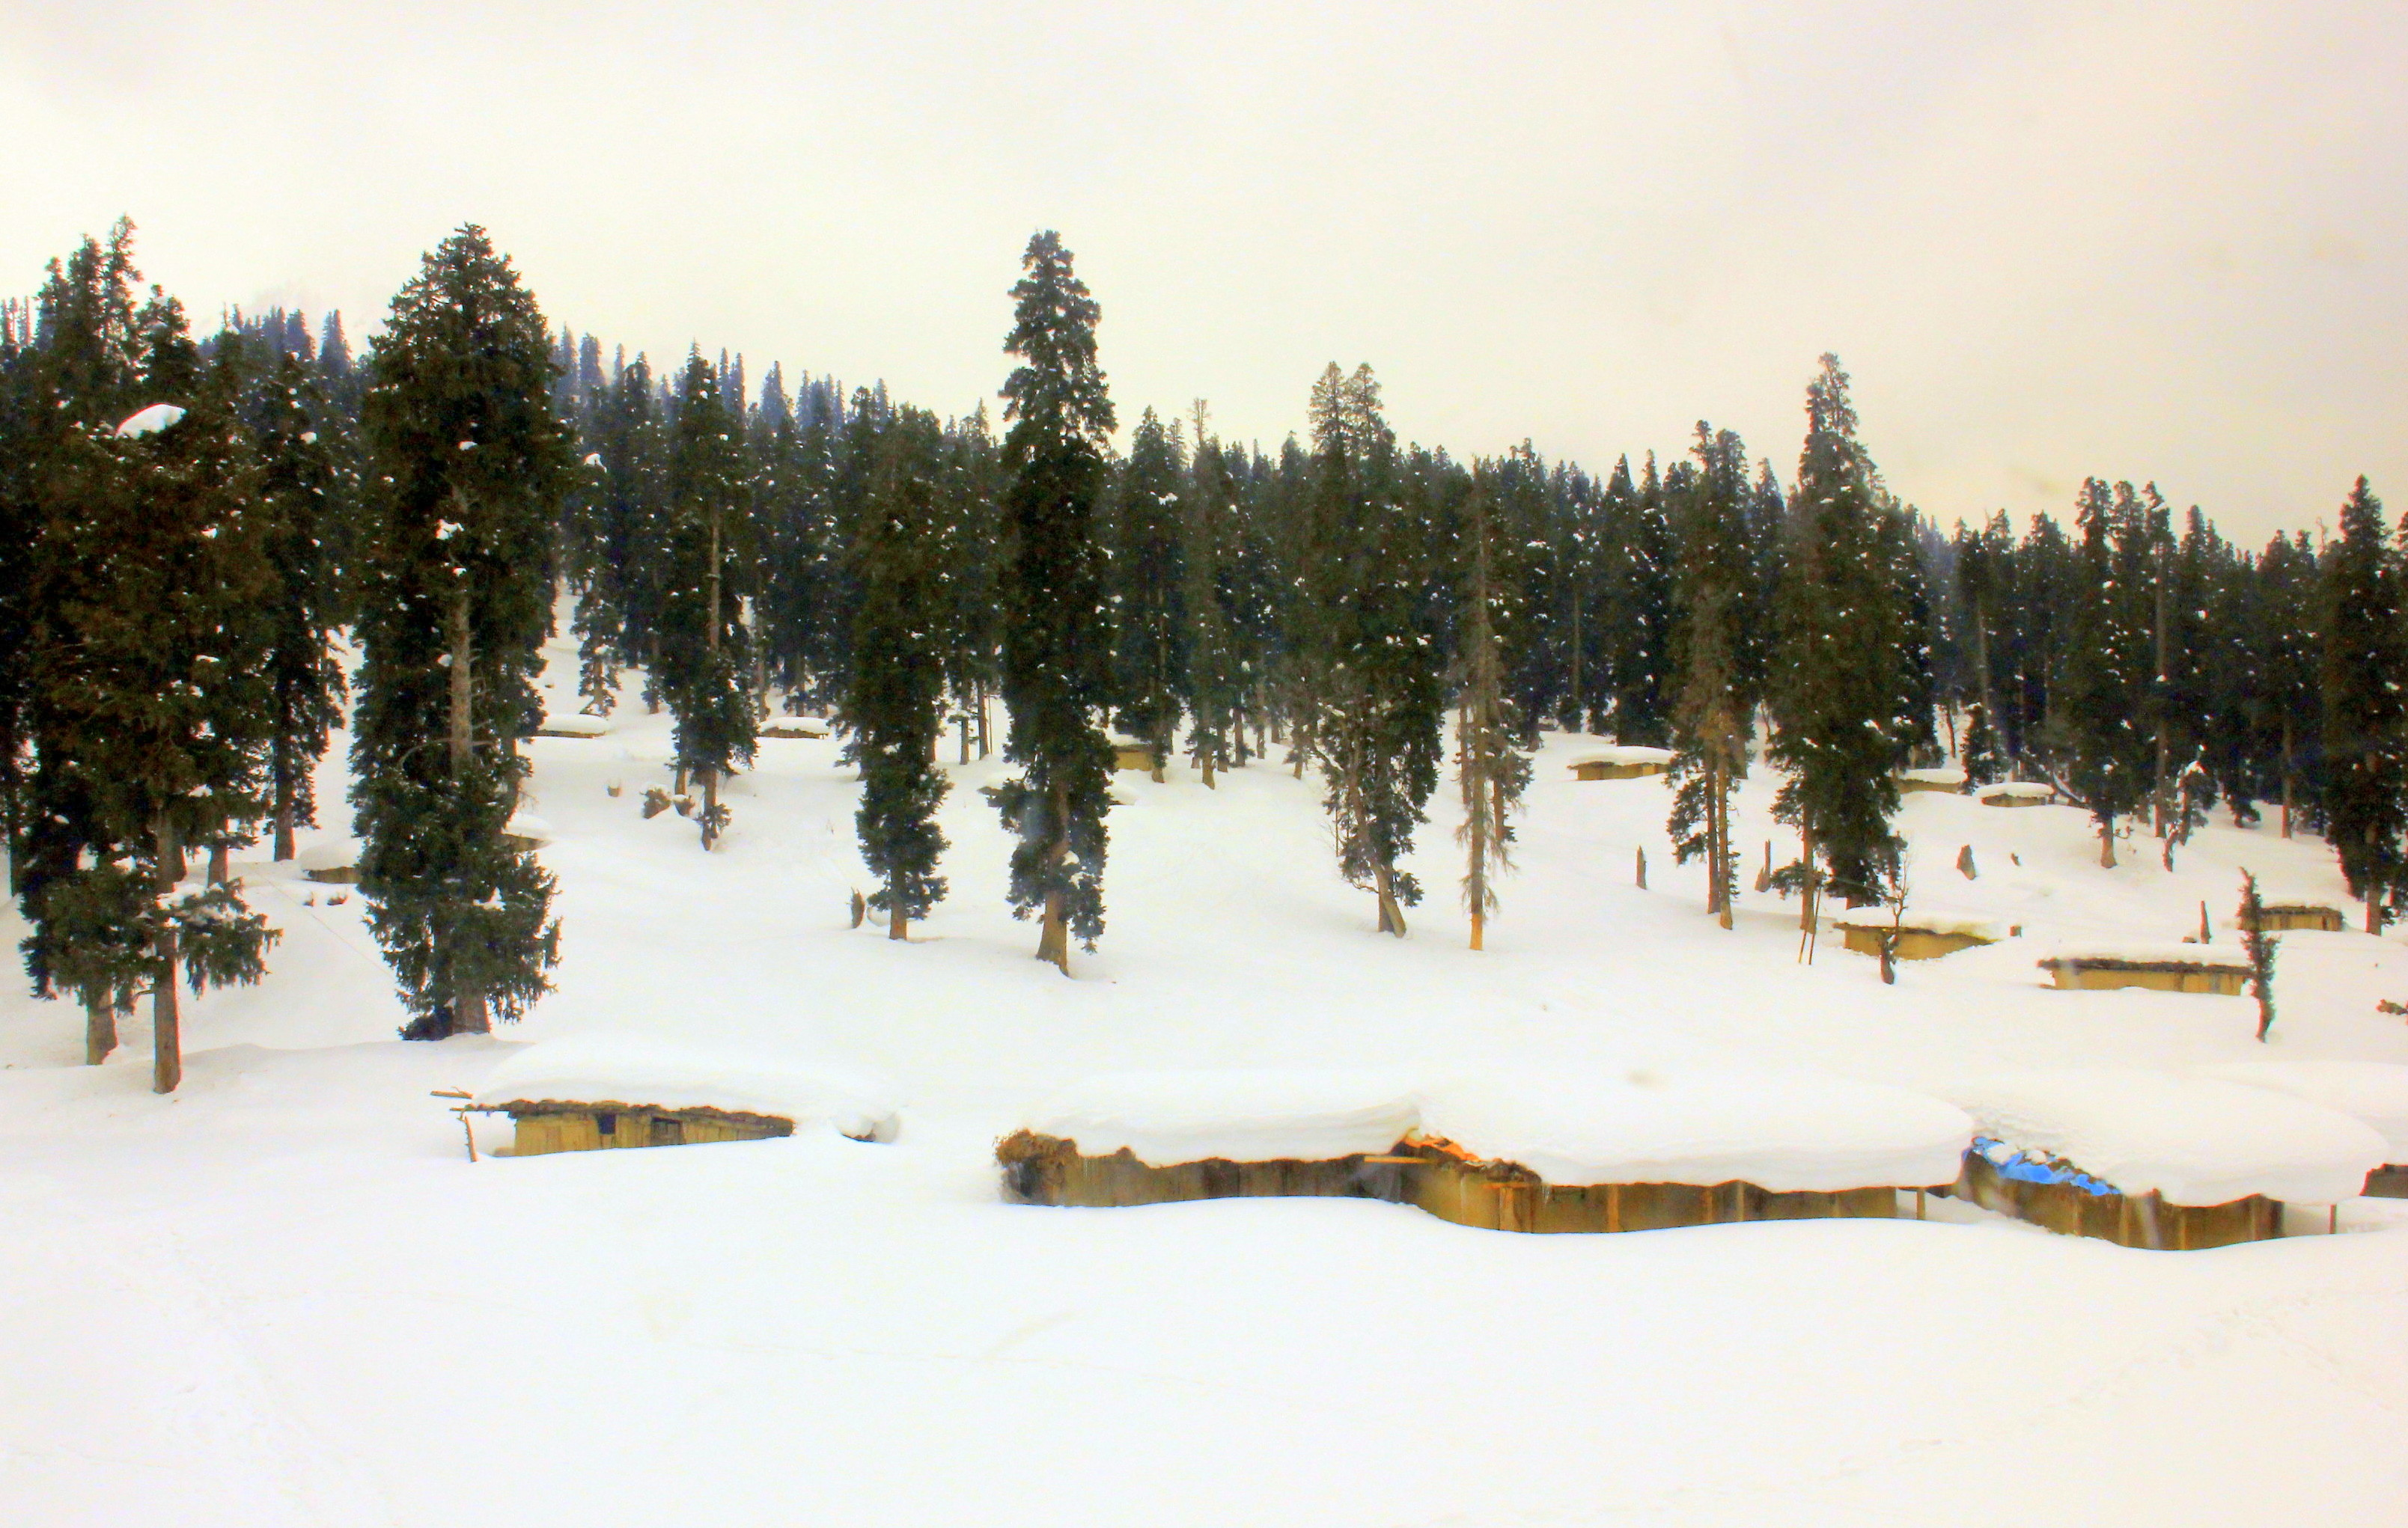 Gulmarg winter is beautiful